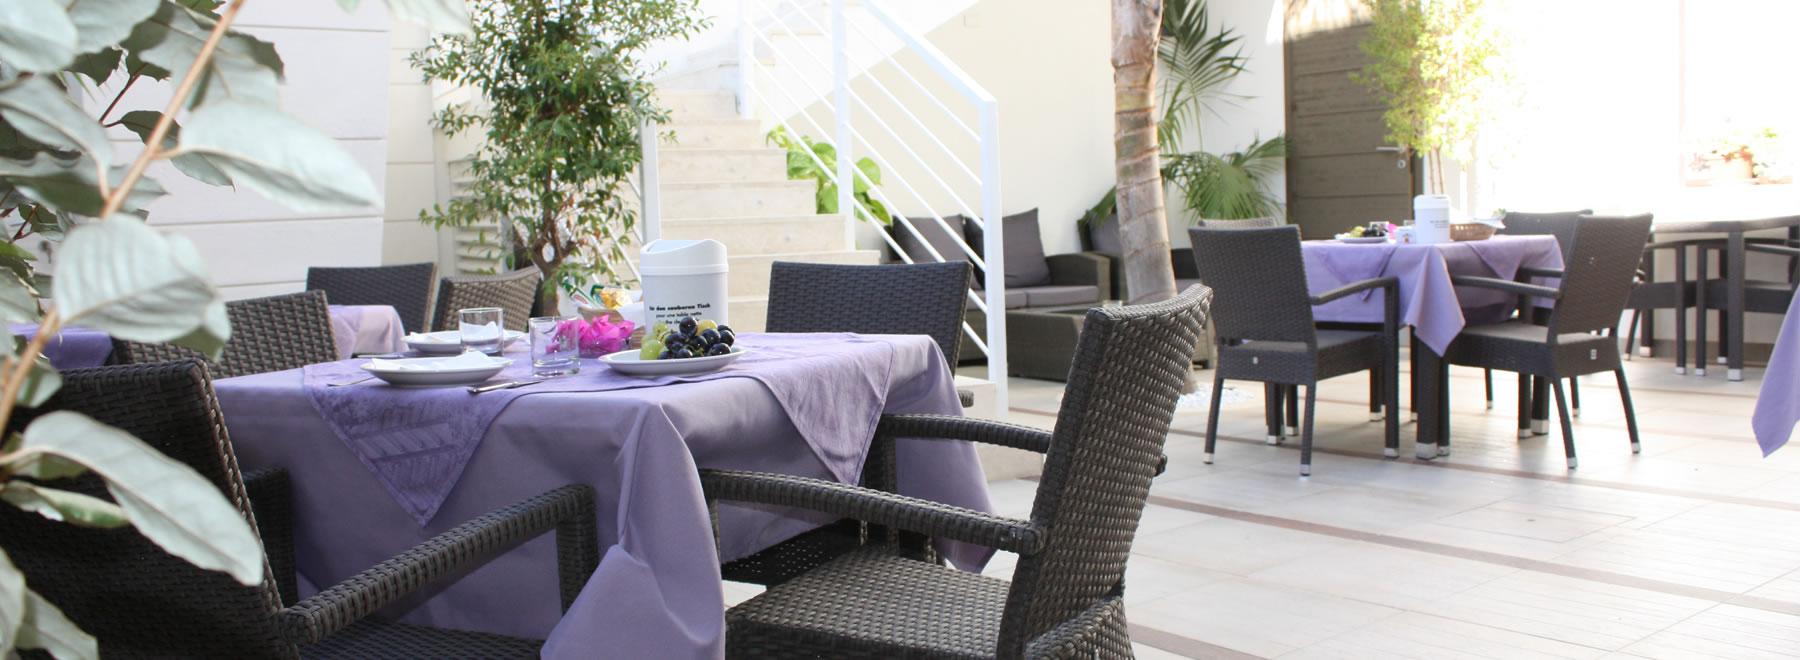 Hotel Belvir Villasimius - B&B e Hotel 3 stelle a ...